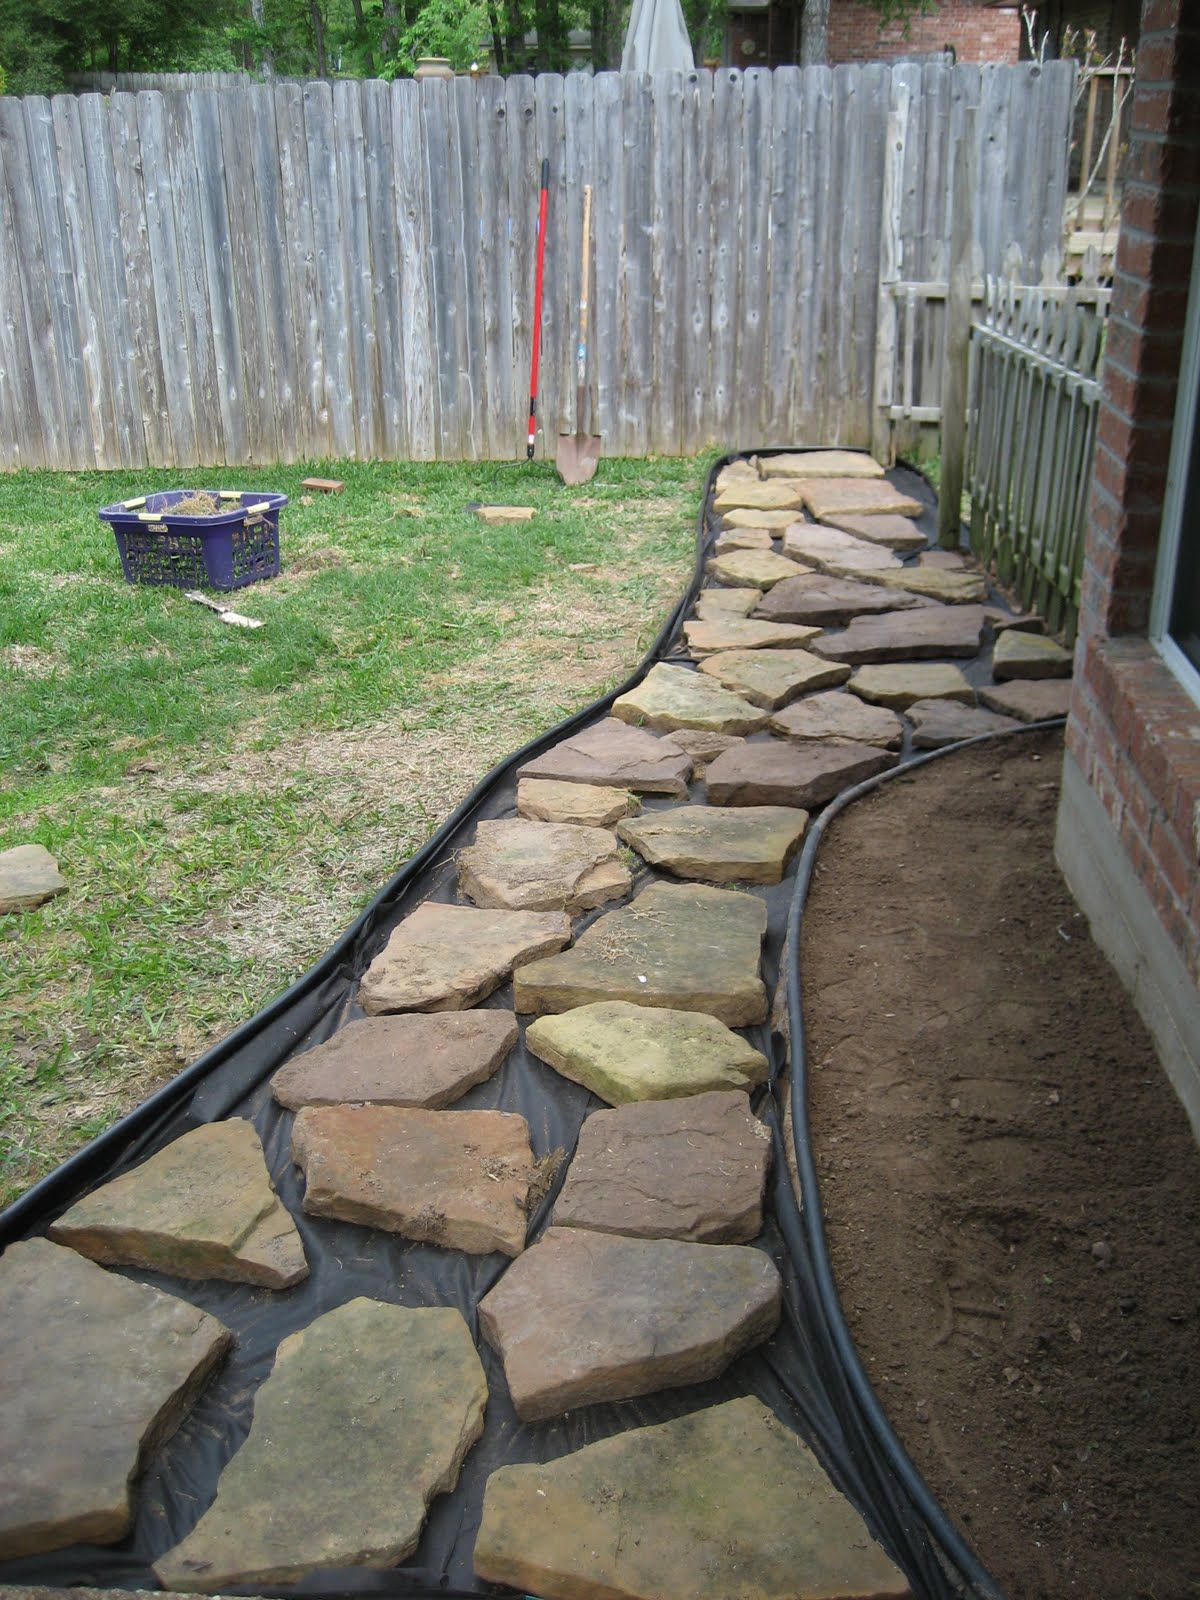 Pin by Karen Siegel on Backyard | Pinterest | Concrete walkway ...